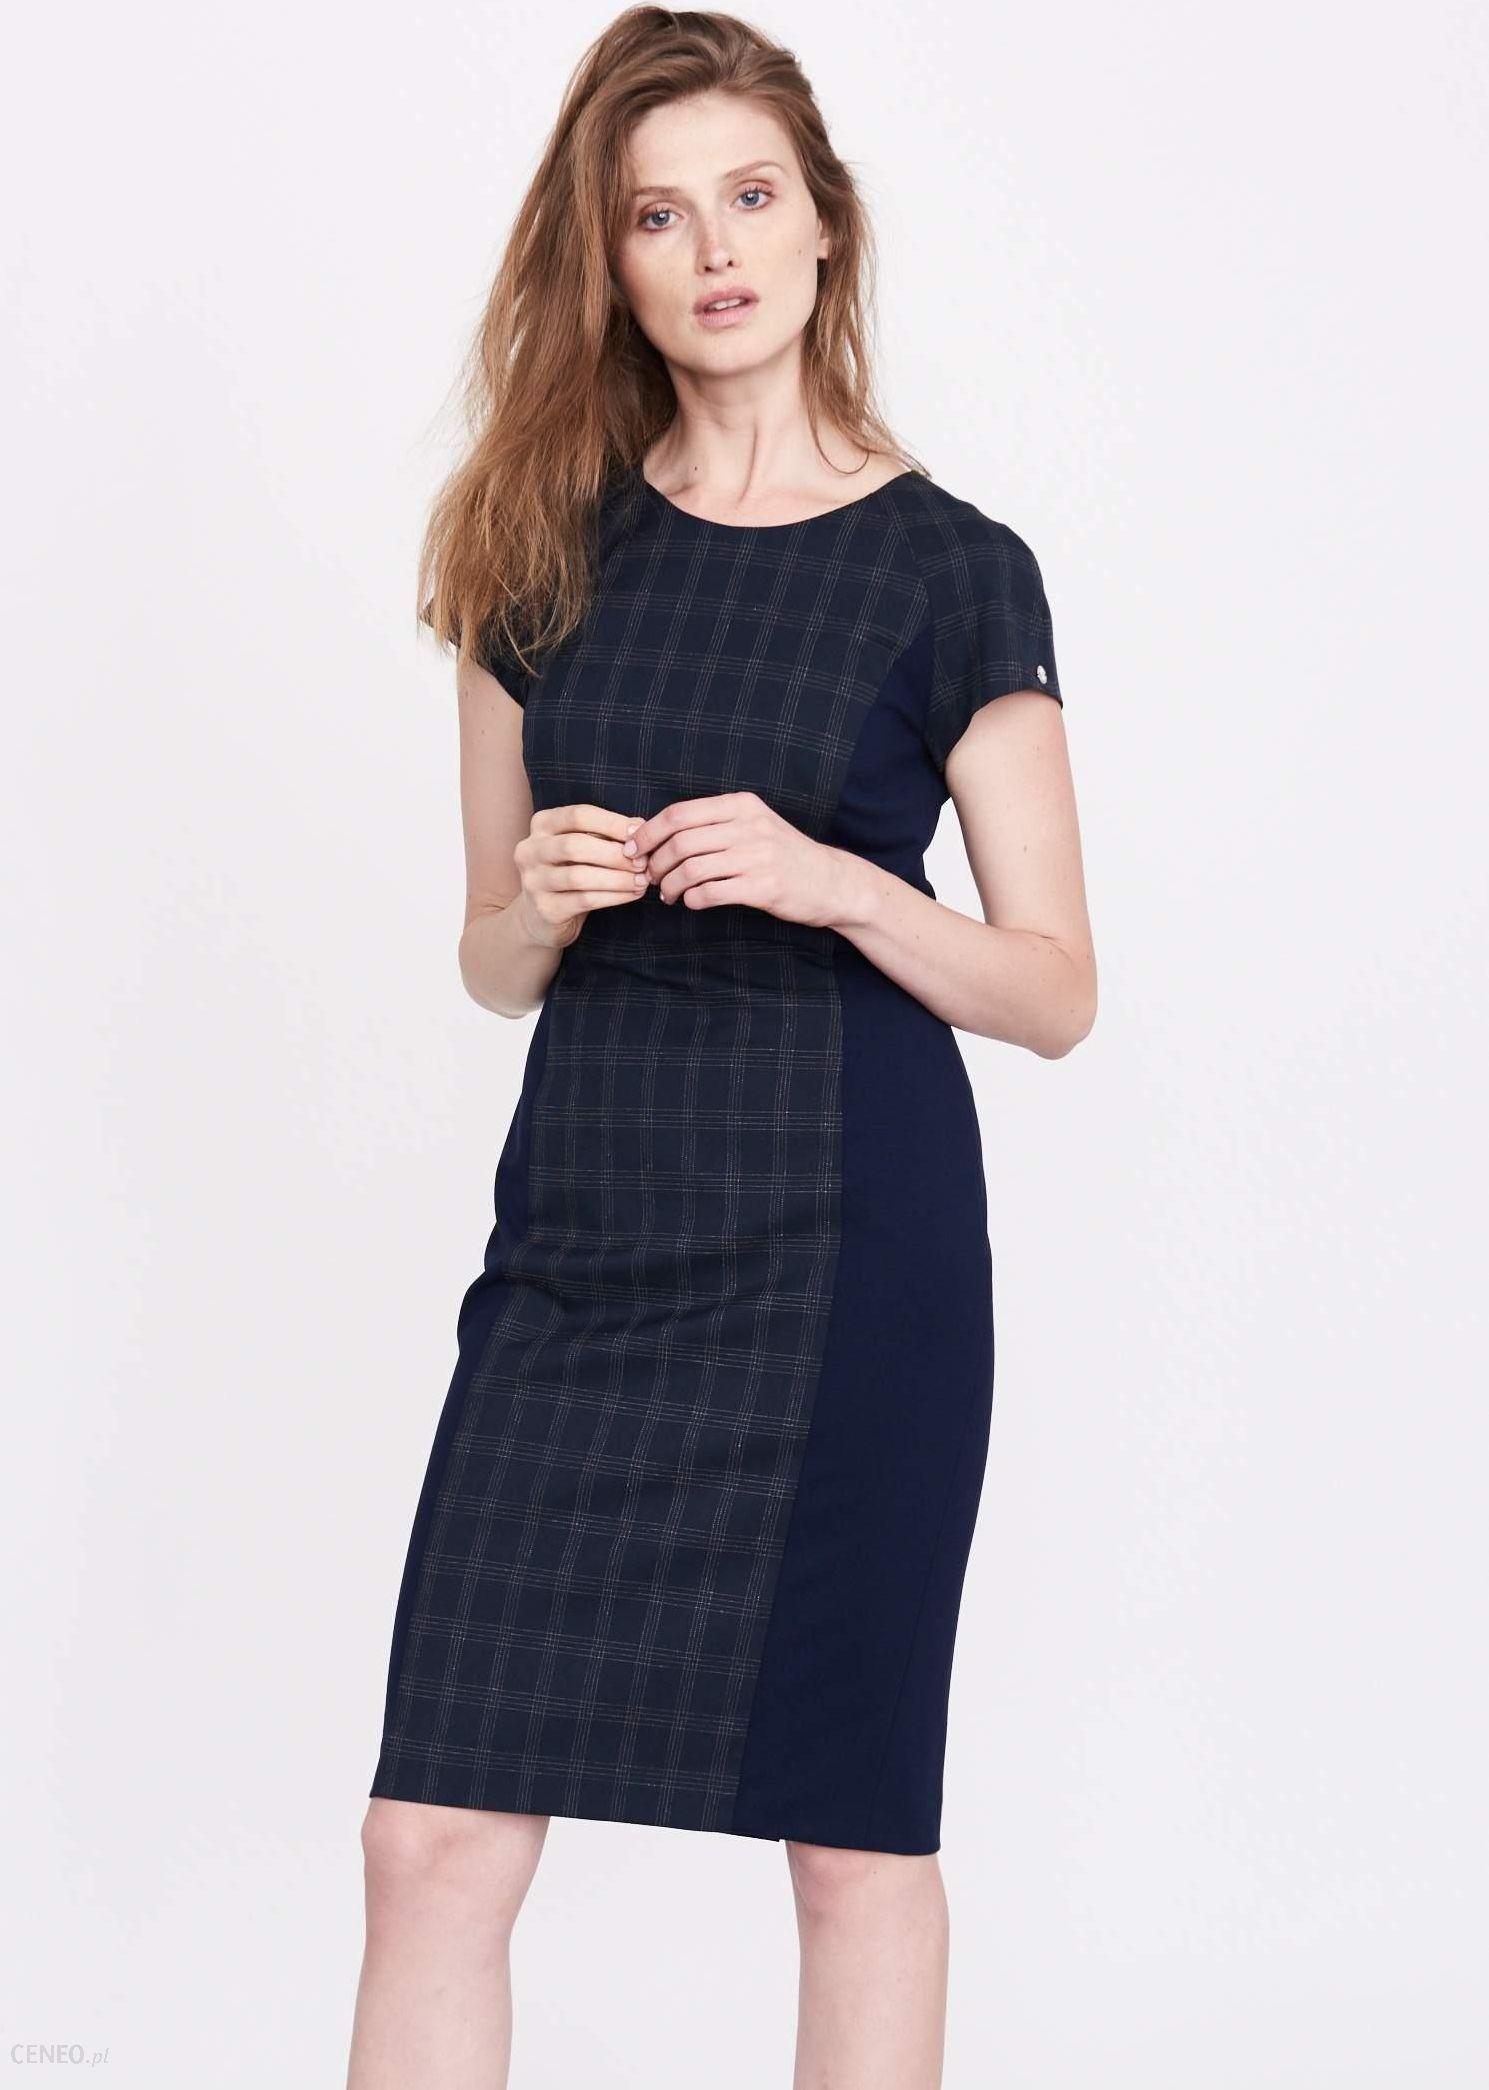 2403c4f22d Simple Sukienka 17717 J.szara navy Blue Krata 44 - Ceny i opinie ...